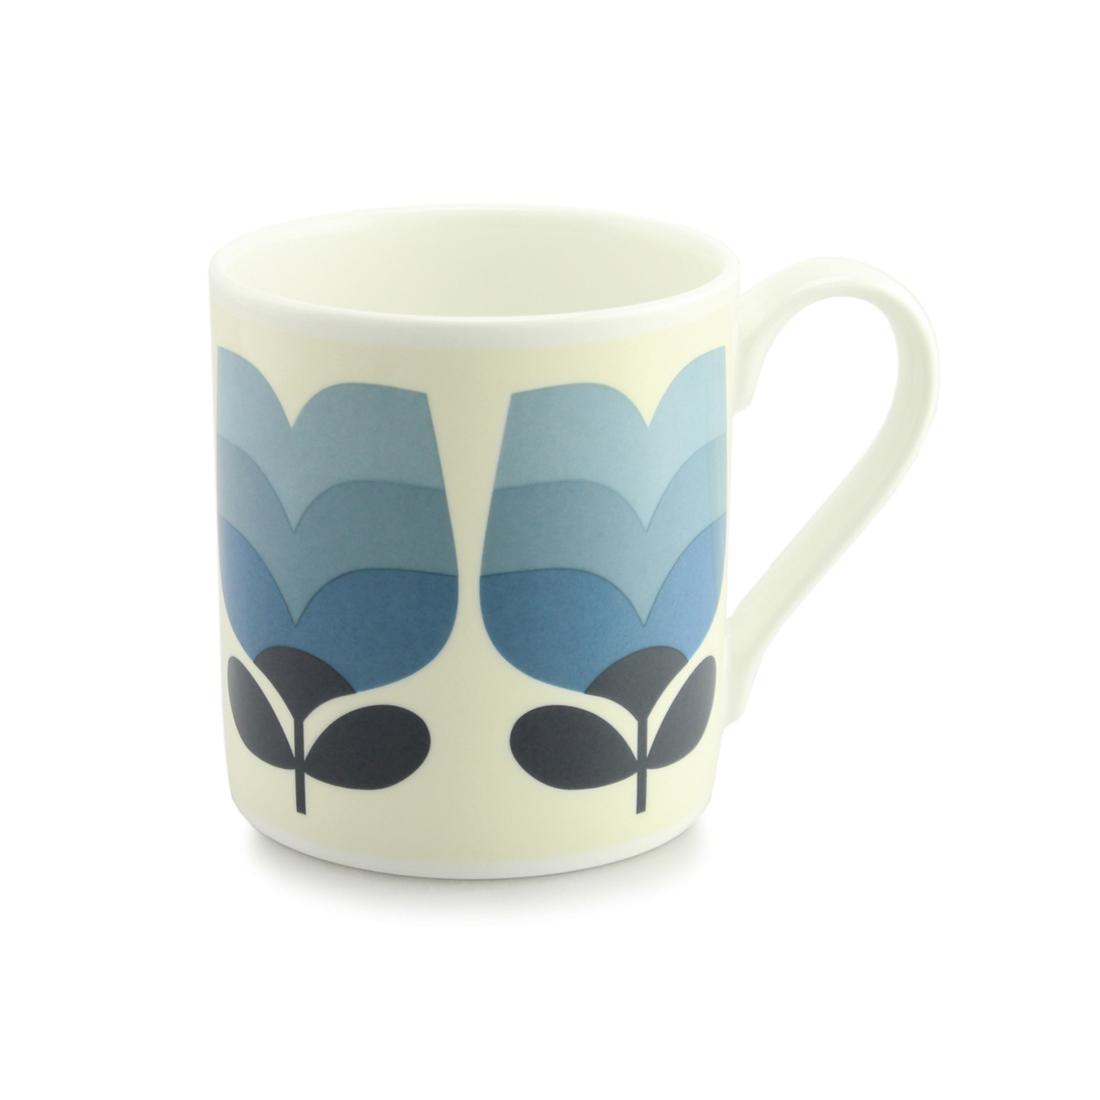 Orla Kiely Quite Big Mug - Periwinkle Tonal Striped